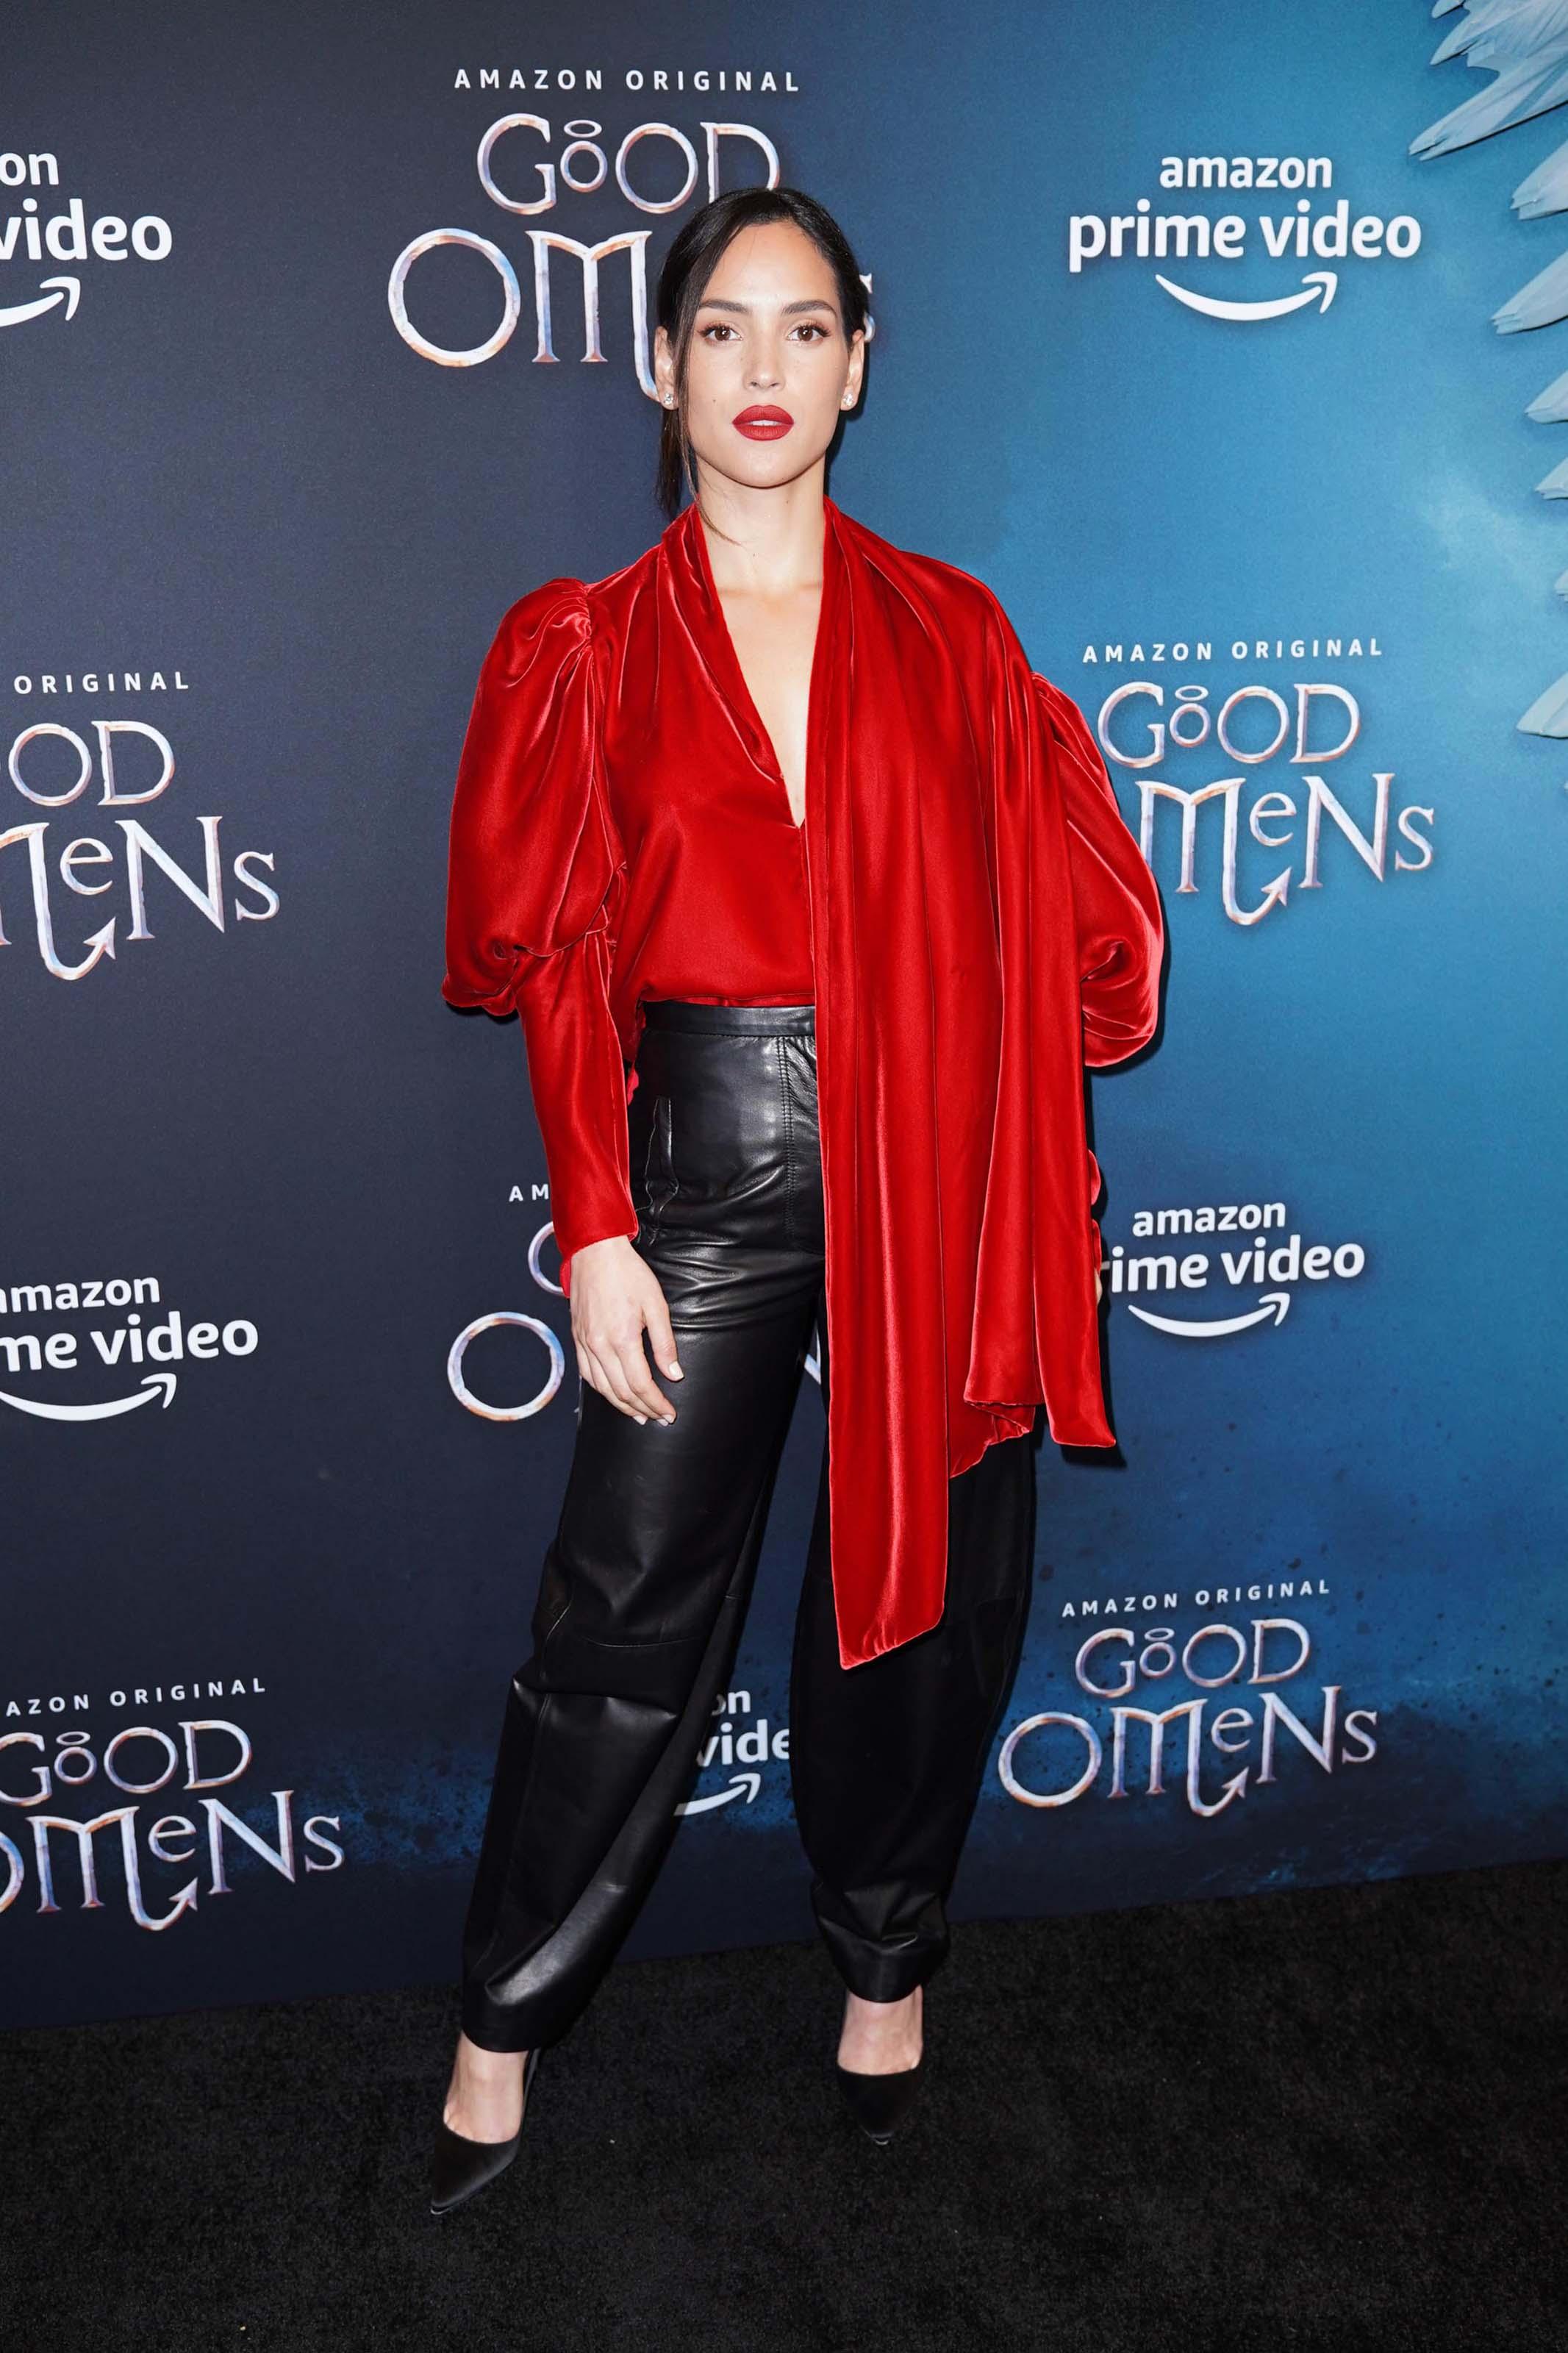 Adria Arjona attends Good Omens Amazon Prime Original screening